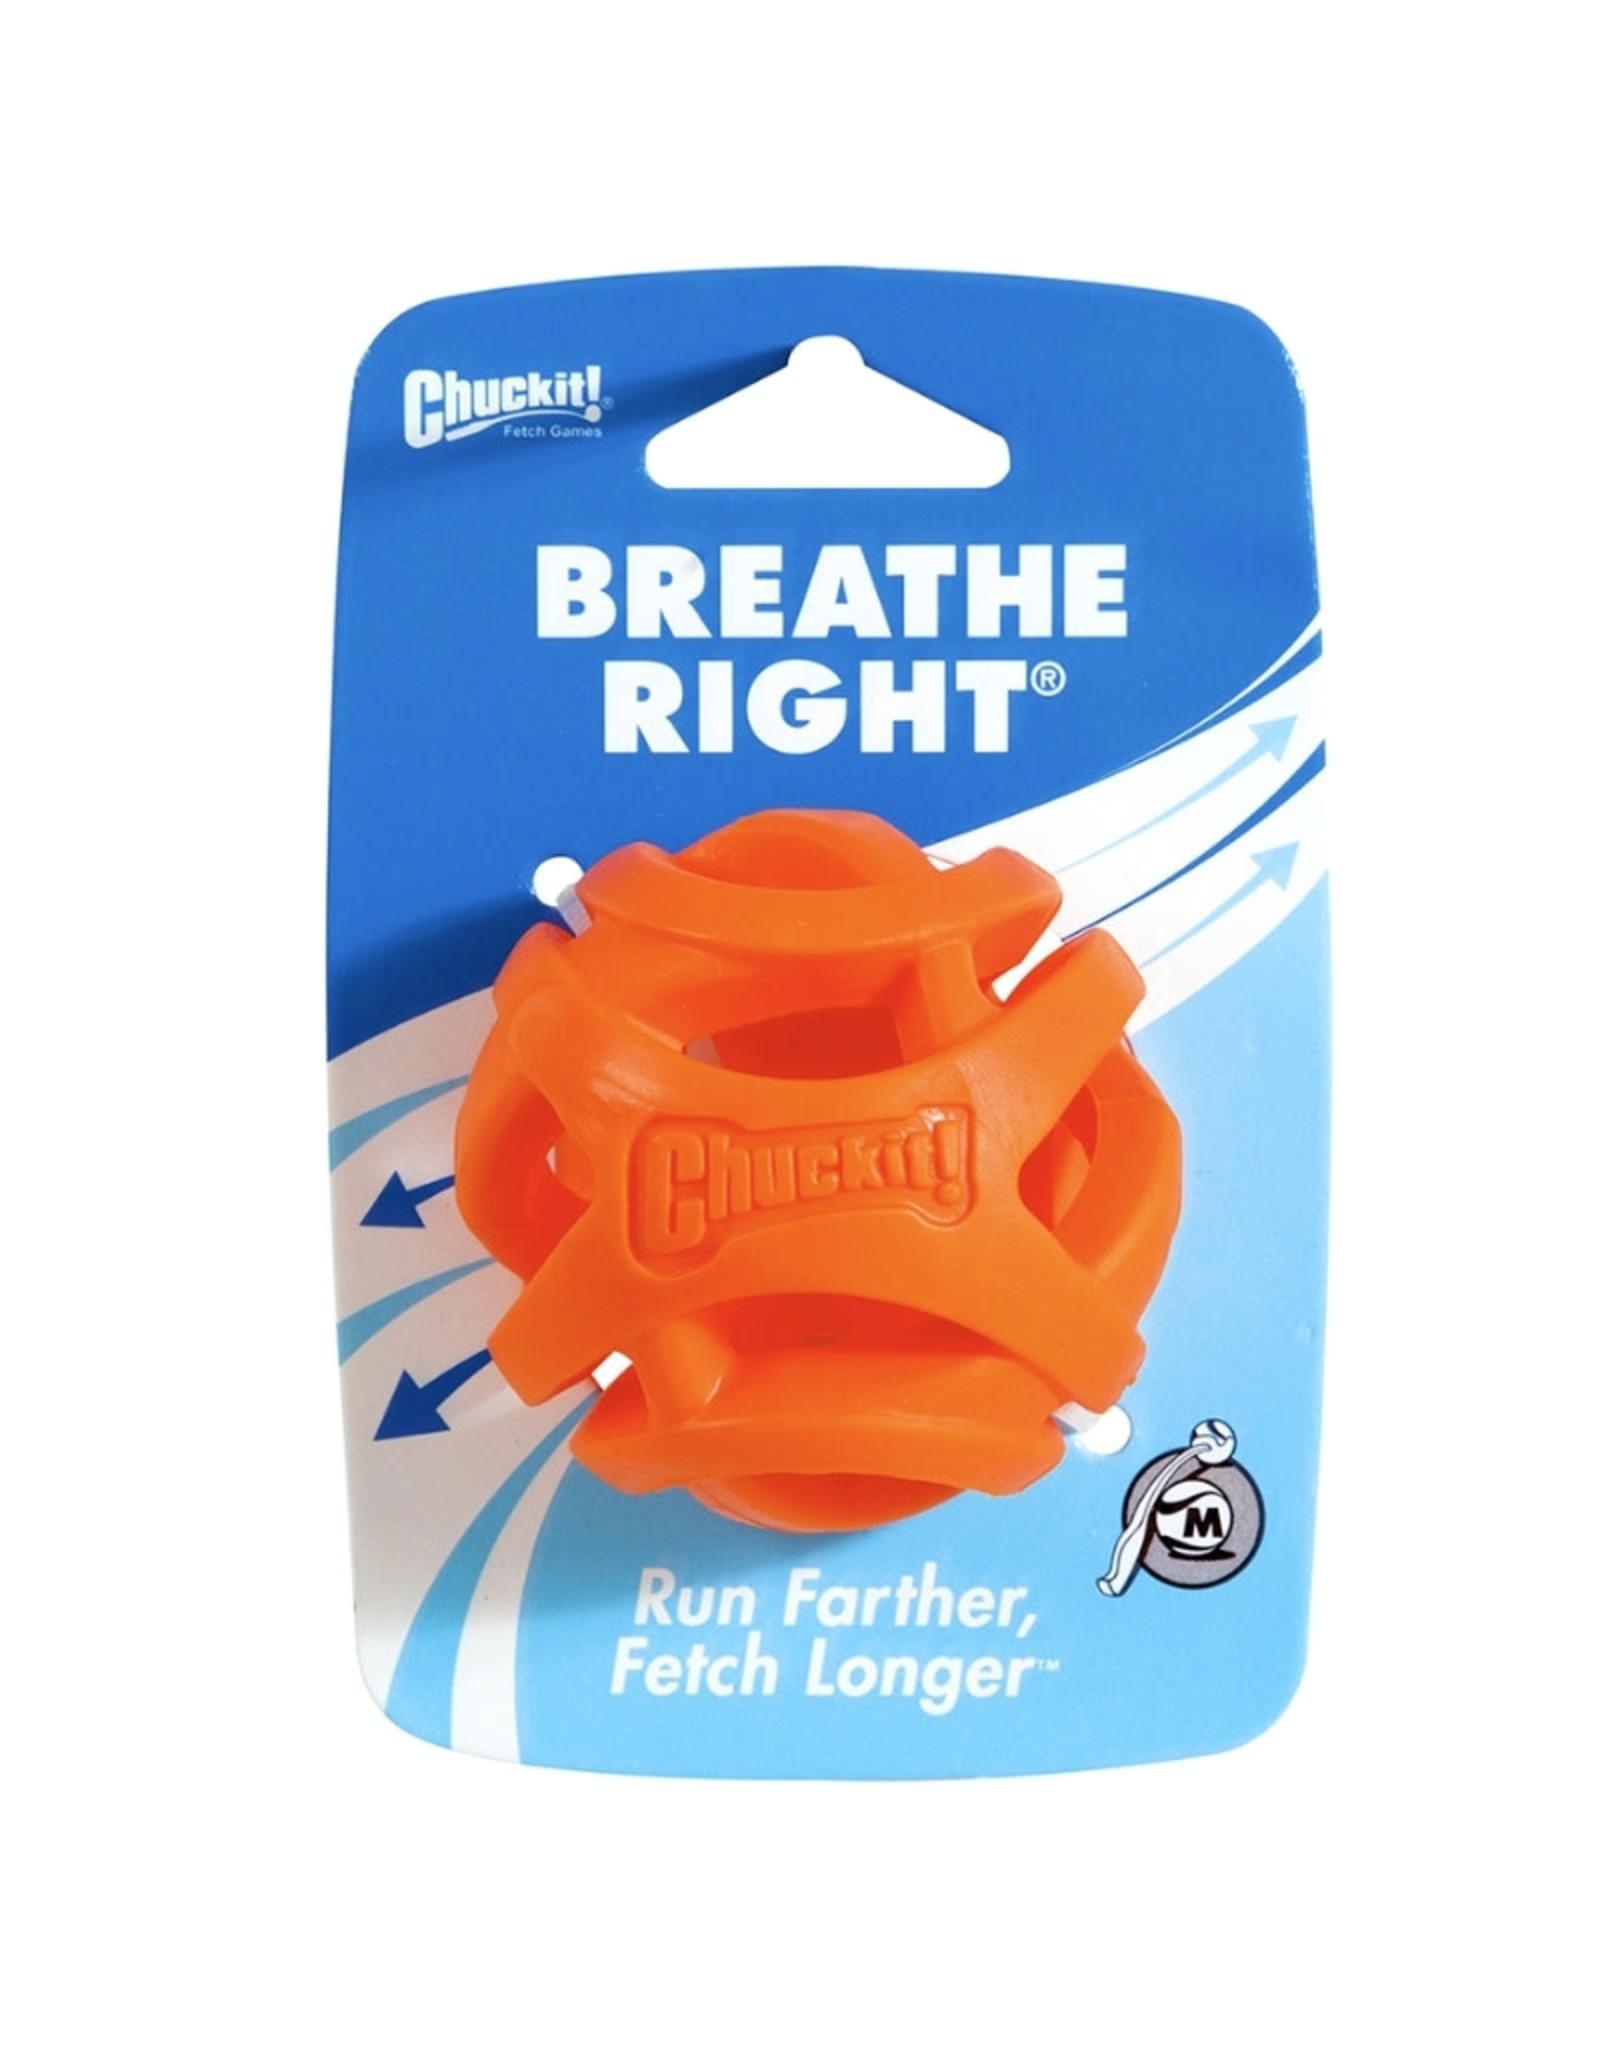 Chuck-it Chuckit! Breathe Right Fetch Ball